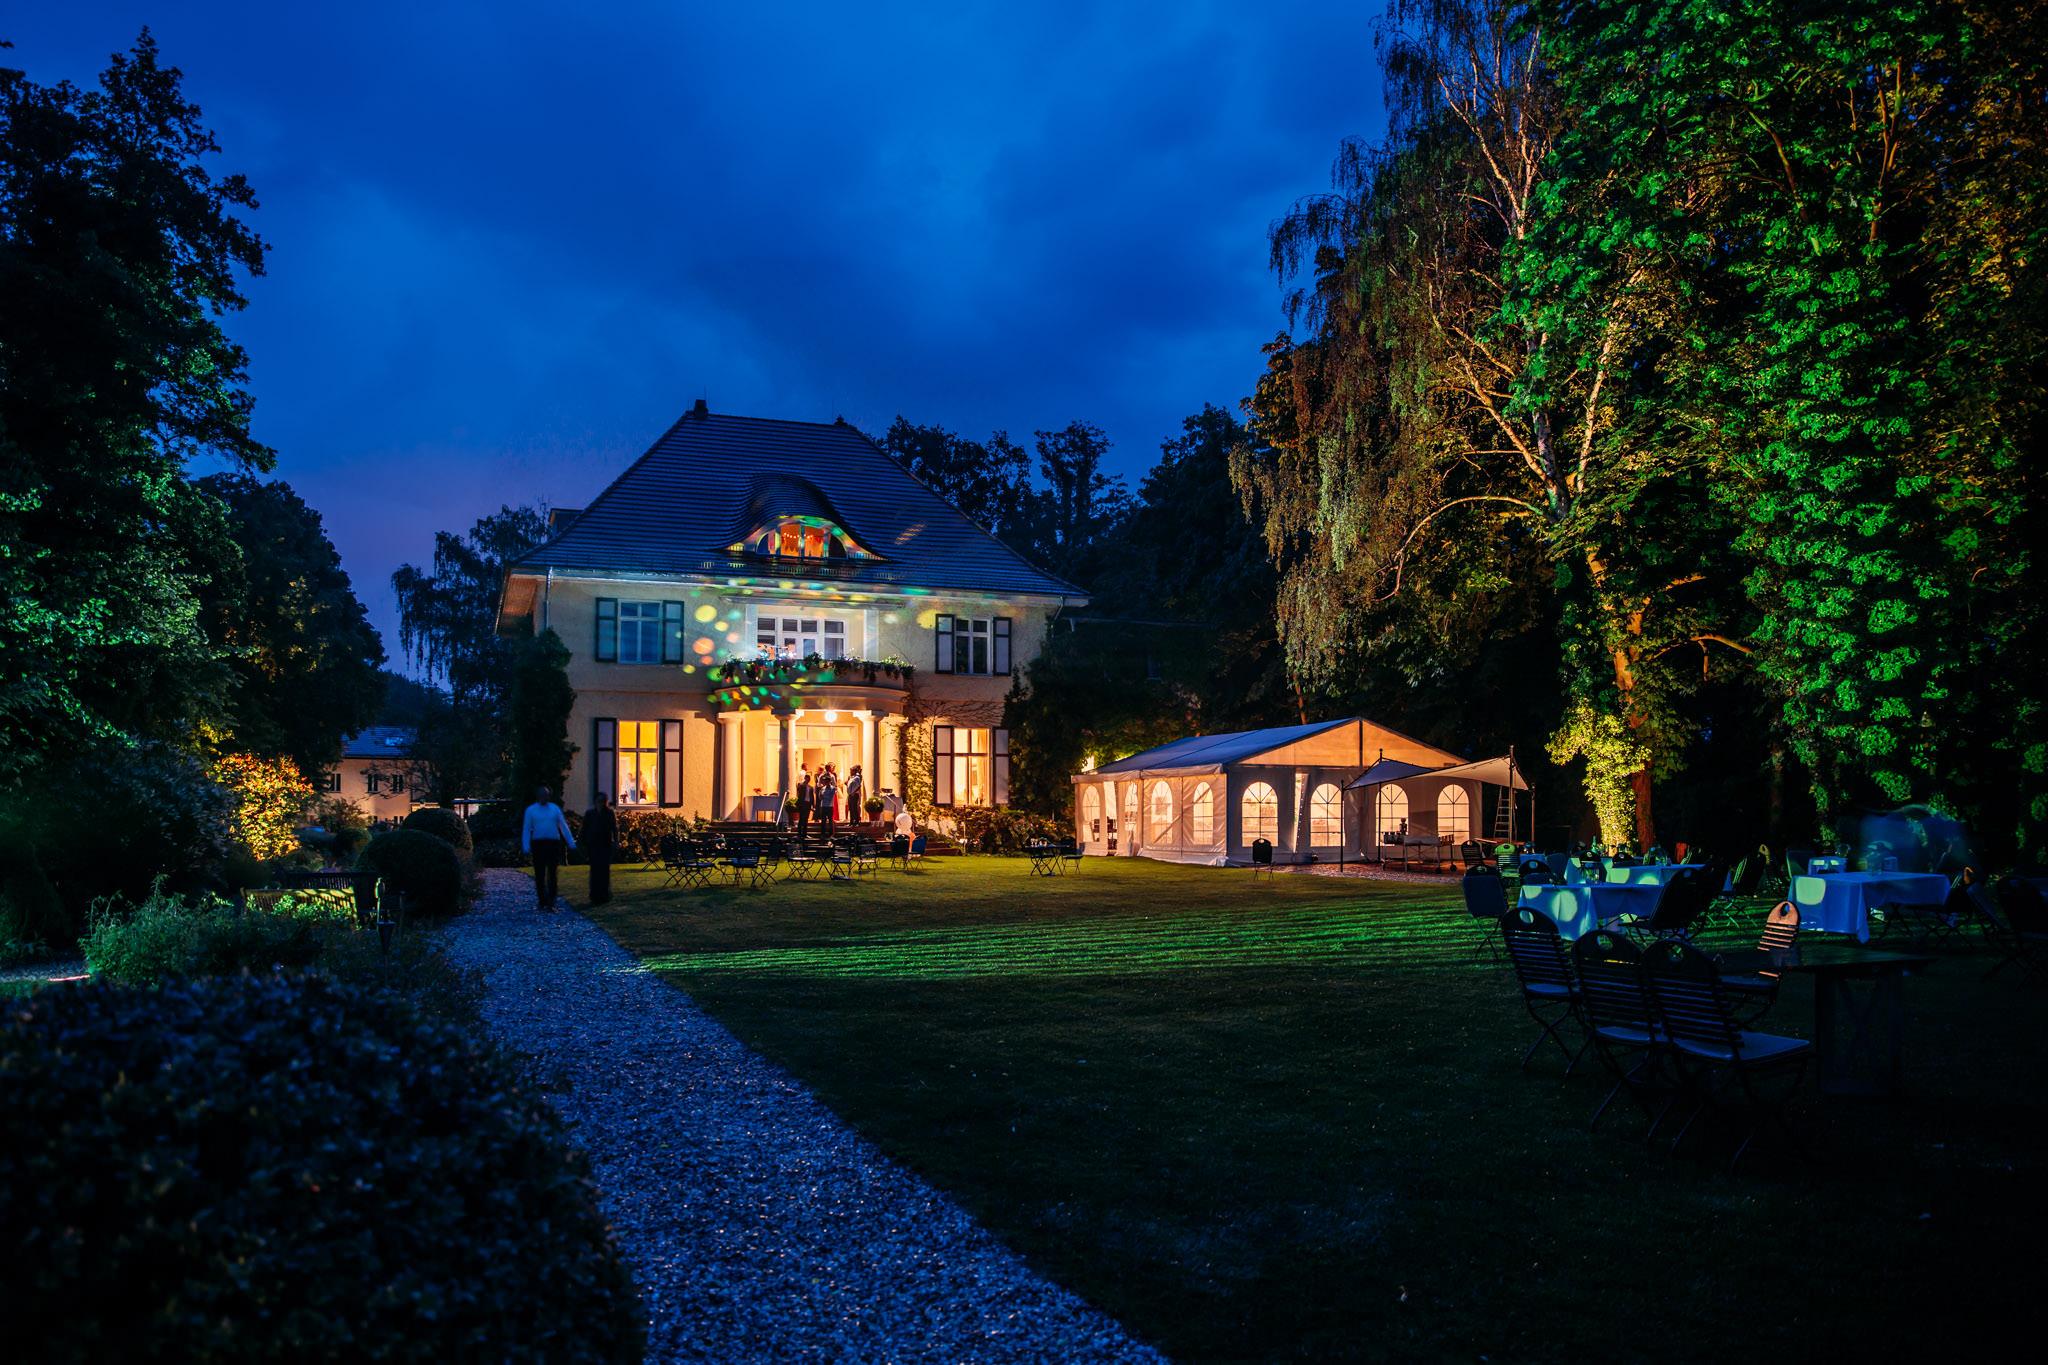 190531_Hochzeit_Potsdam_Schloss_Gut_Golm_Vorschau_web_0026.jpg